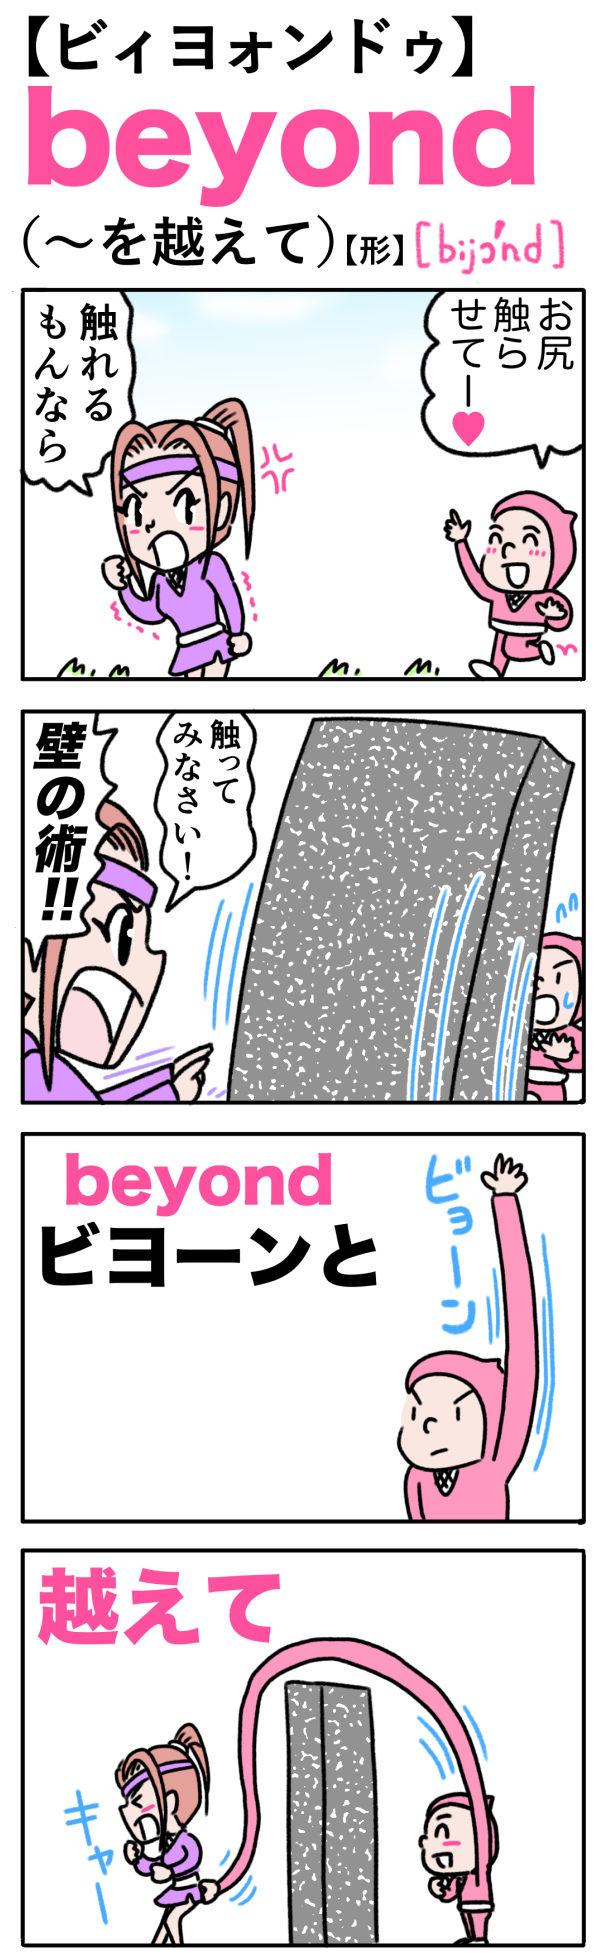 beyond(〜を越えて)の語呂合わせ英単語